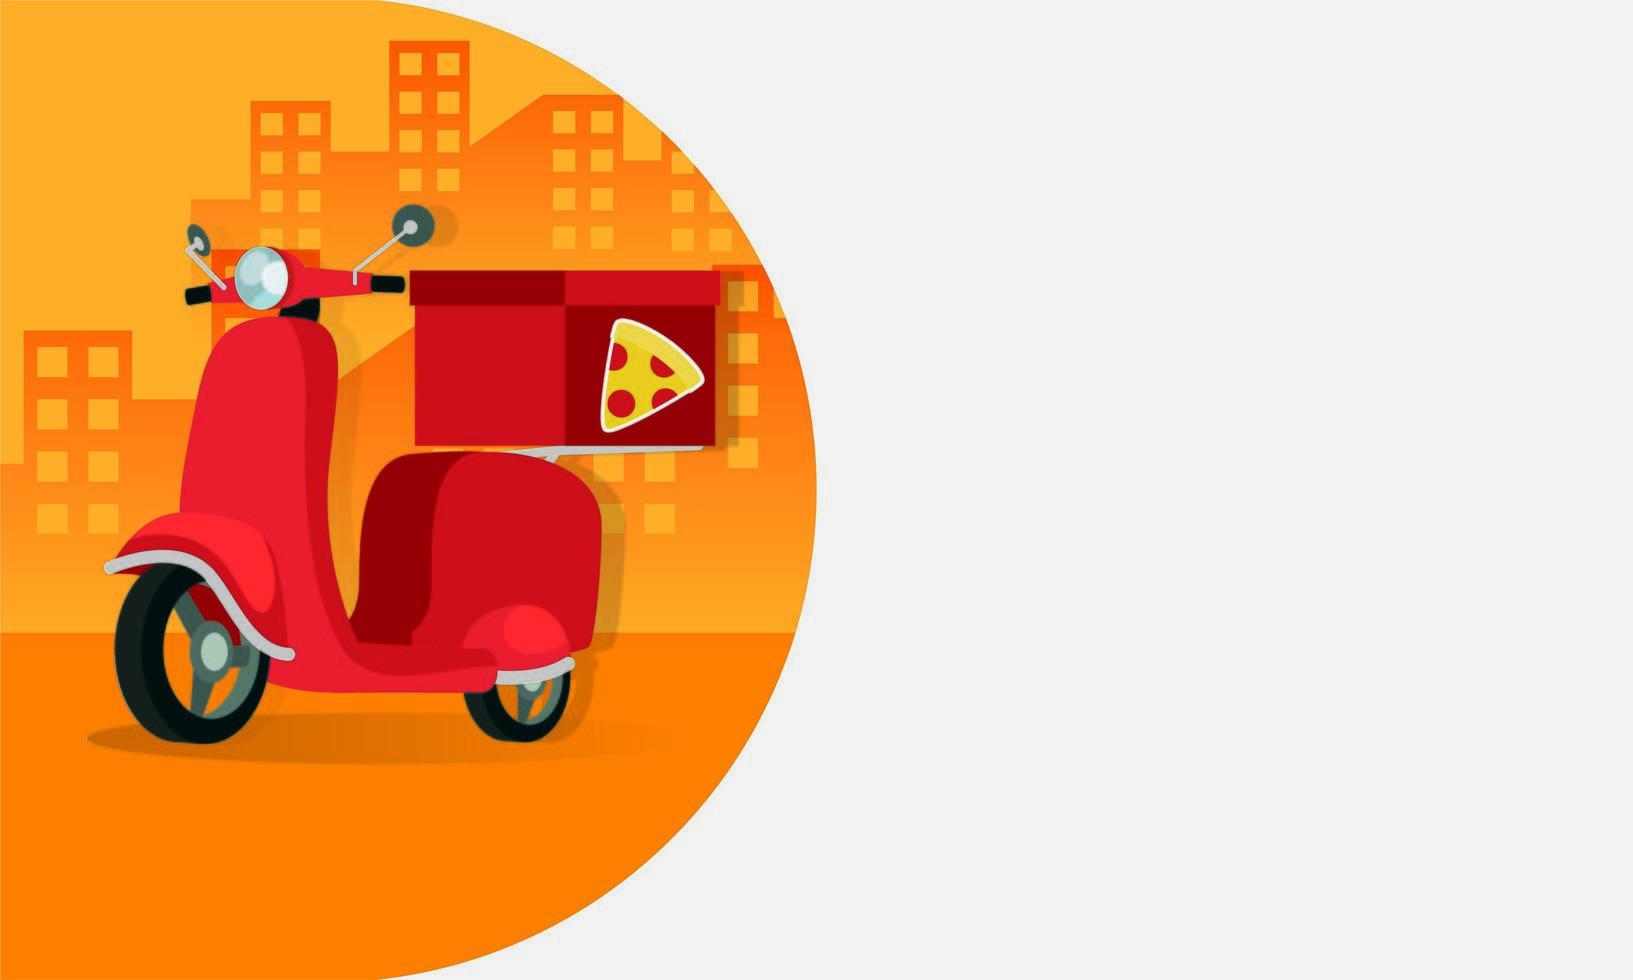 leverans pizza motorcykel isolerad ikon vektor